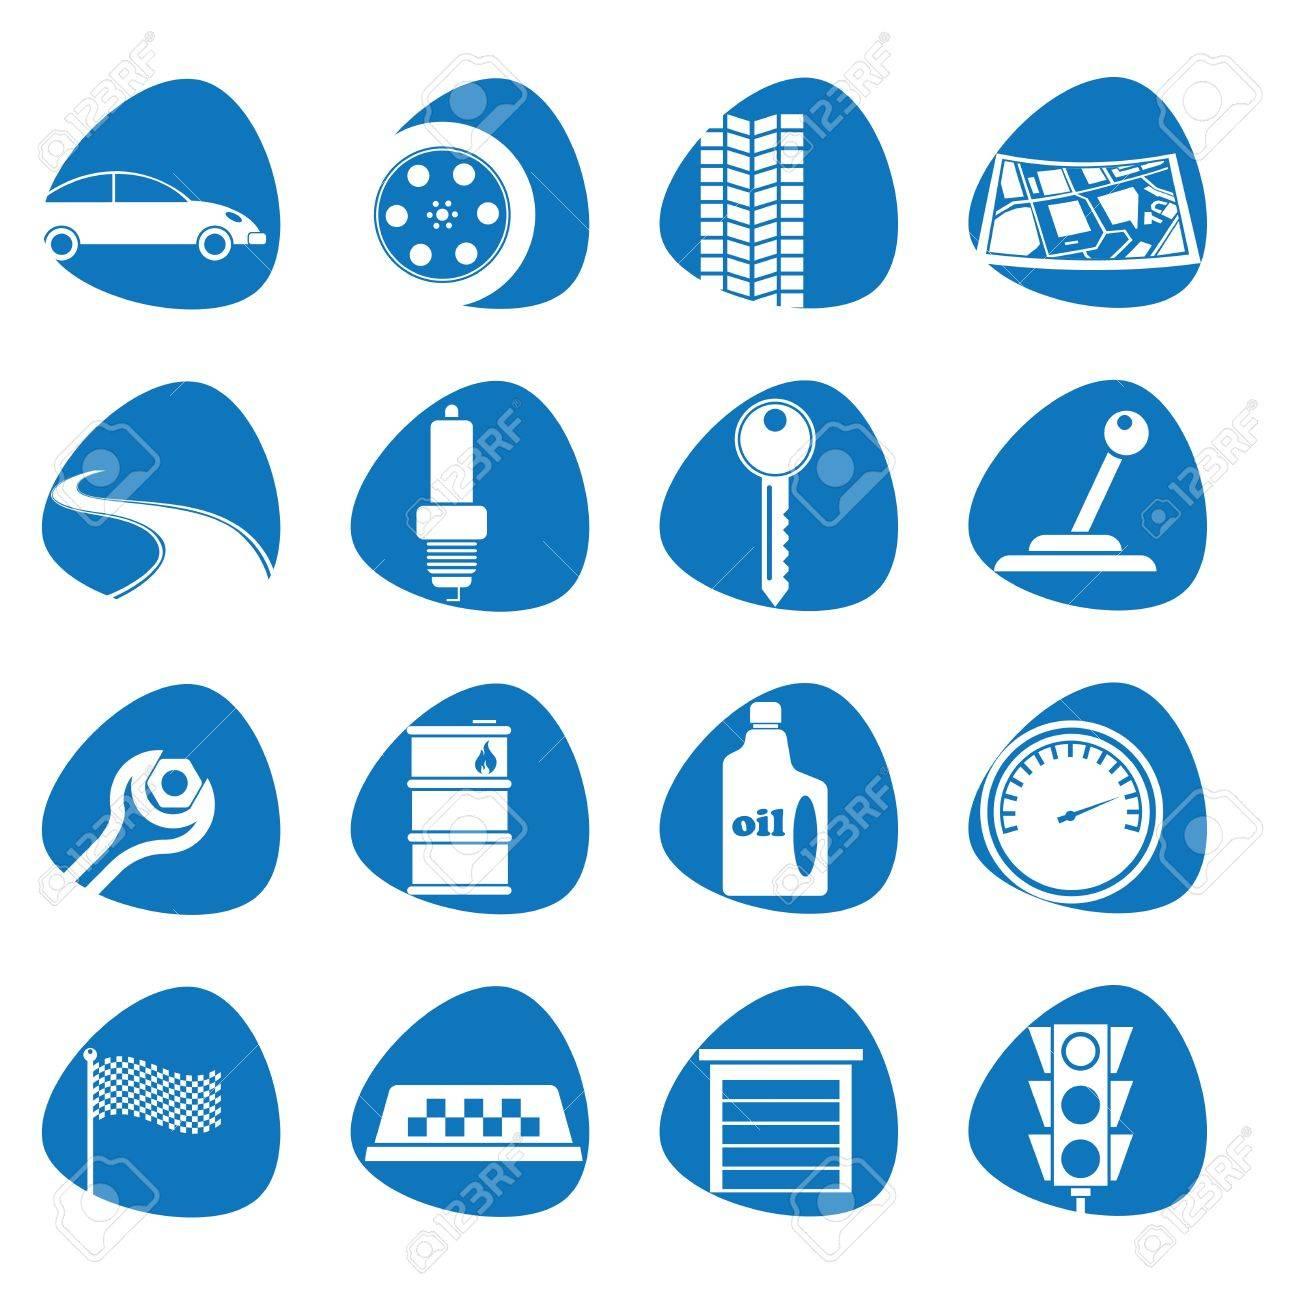 illustration icons on the Tamu Car Stock Vector - 14020924